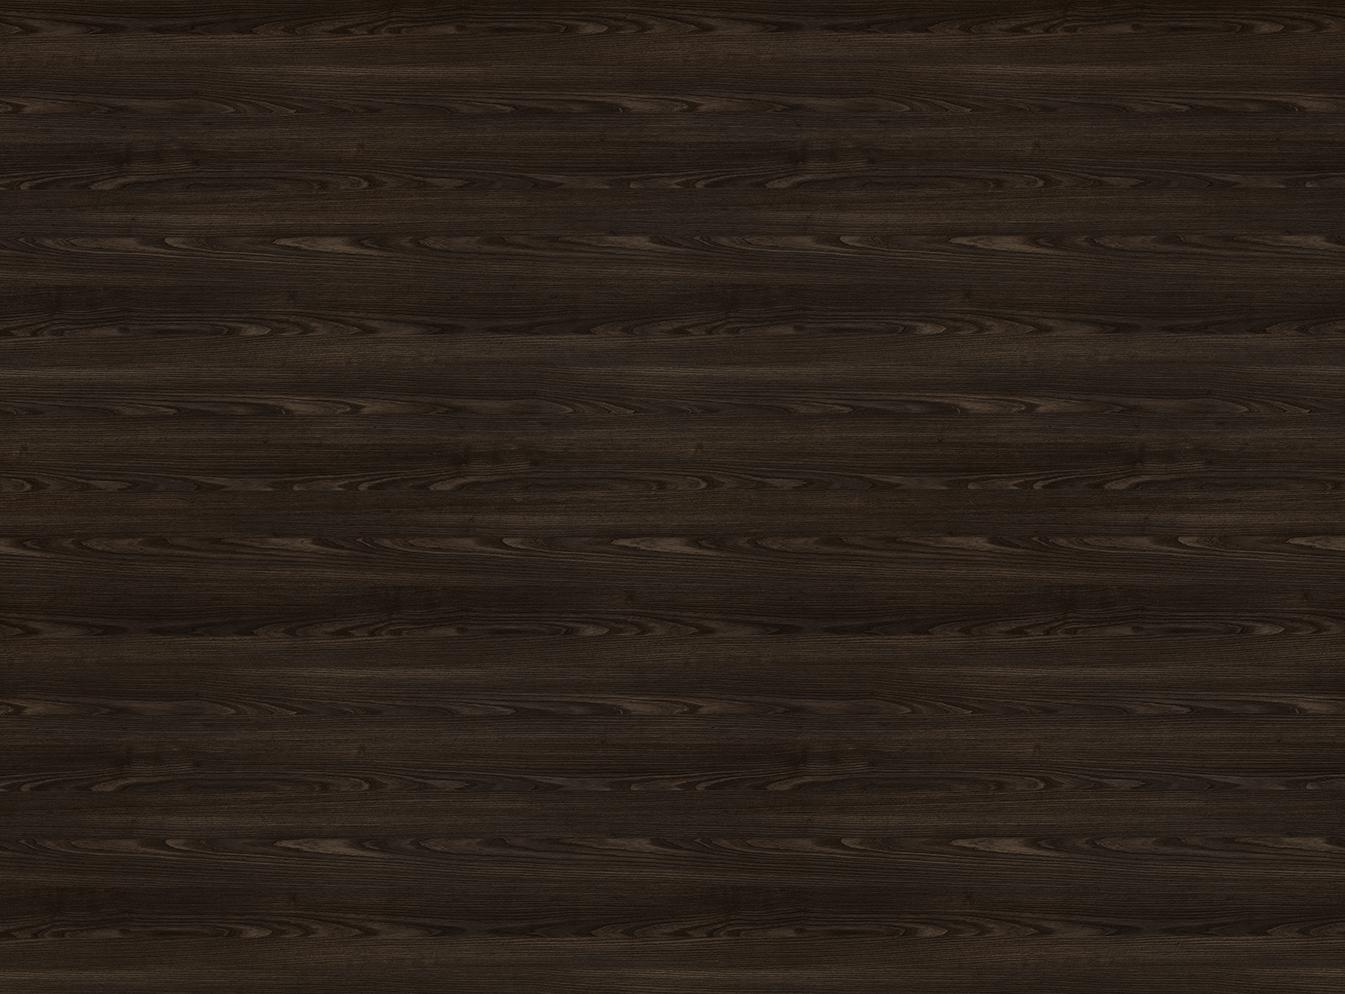 Лента AБC S141 23/1 Tivoli